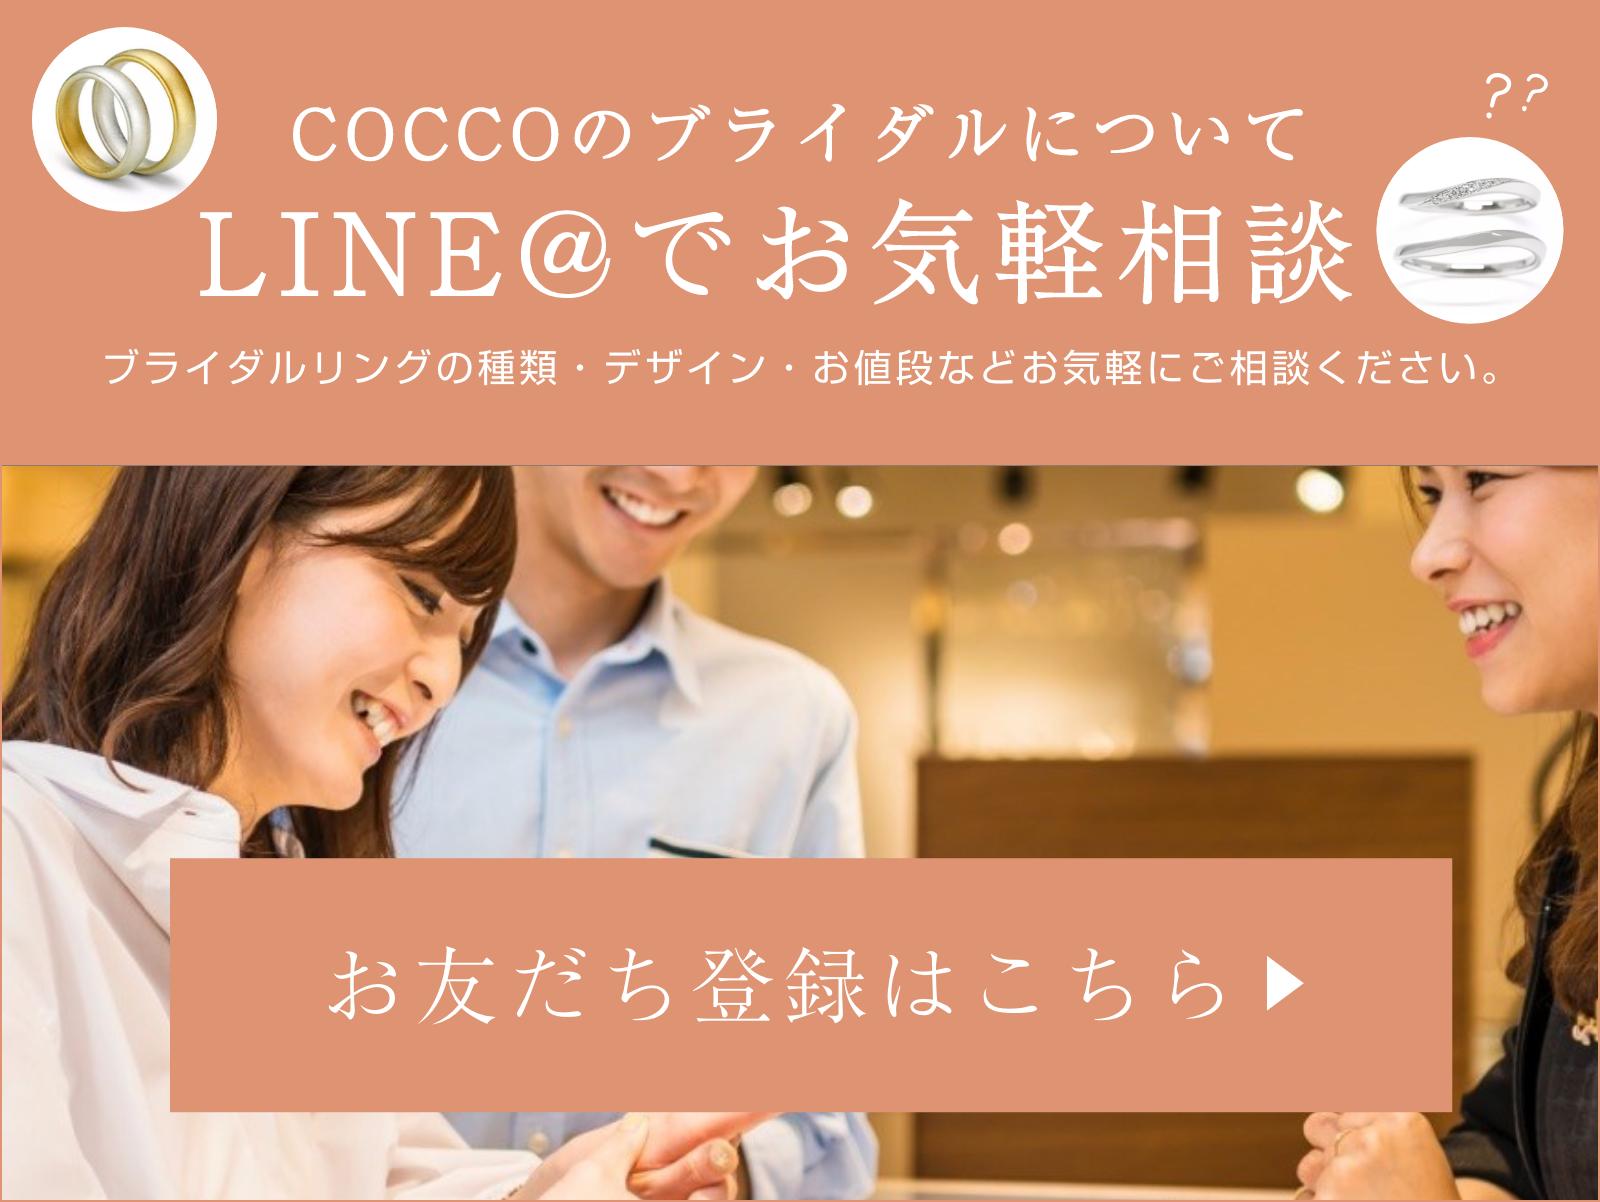 LINE@でお気軽相談